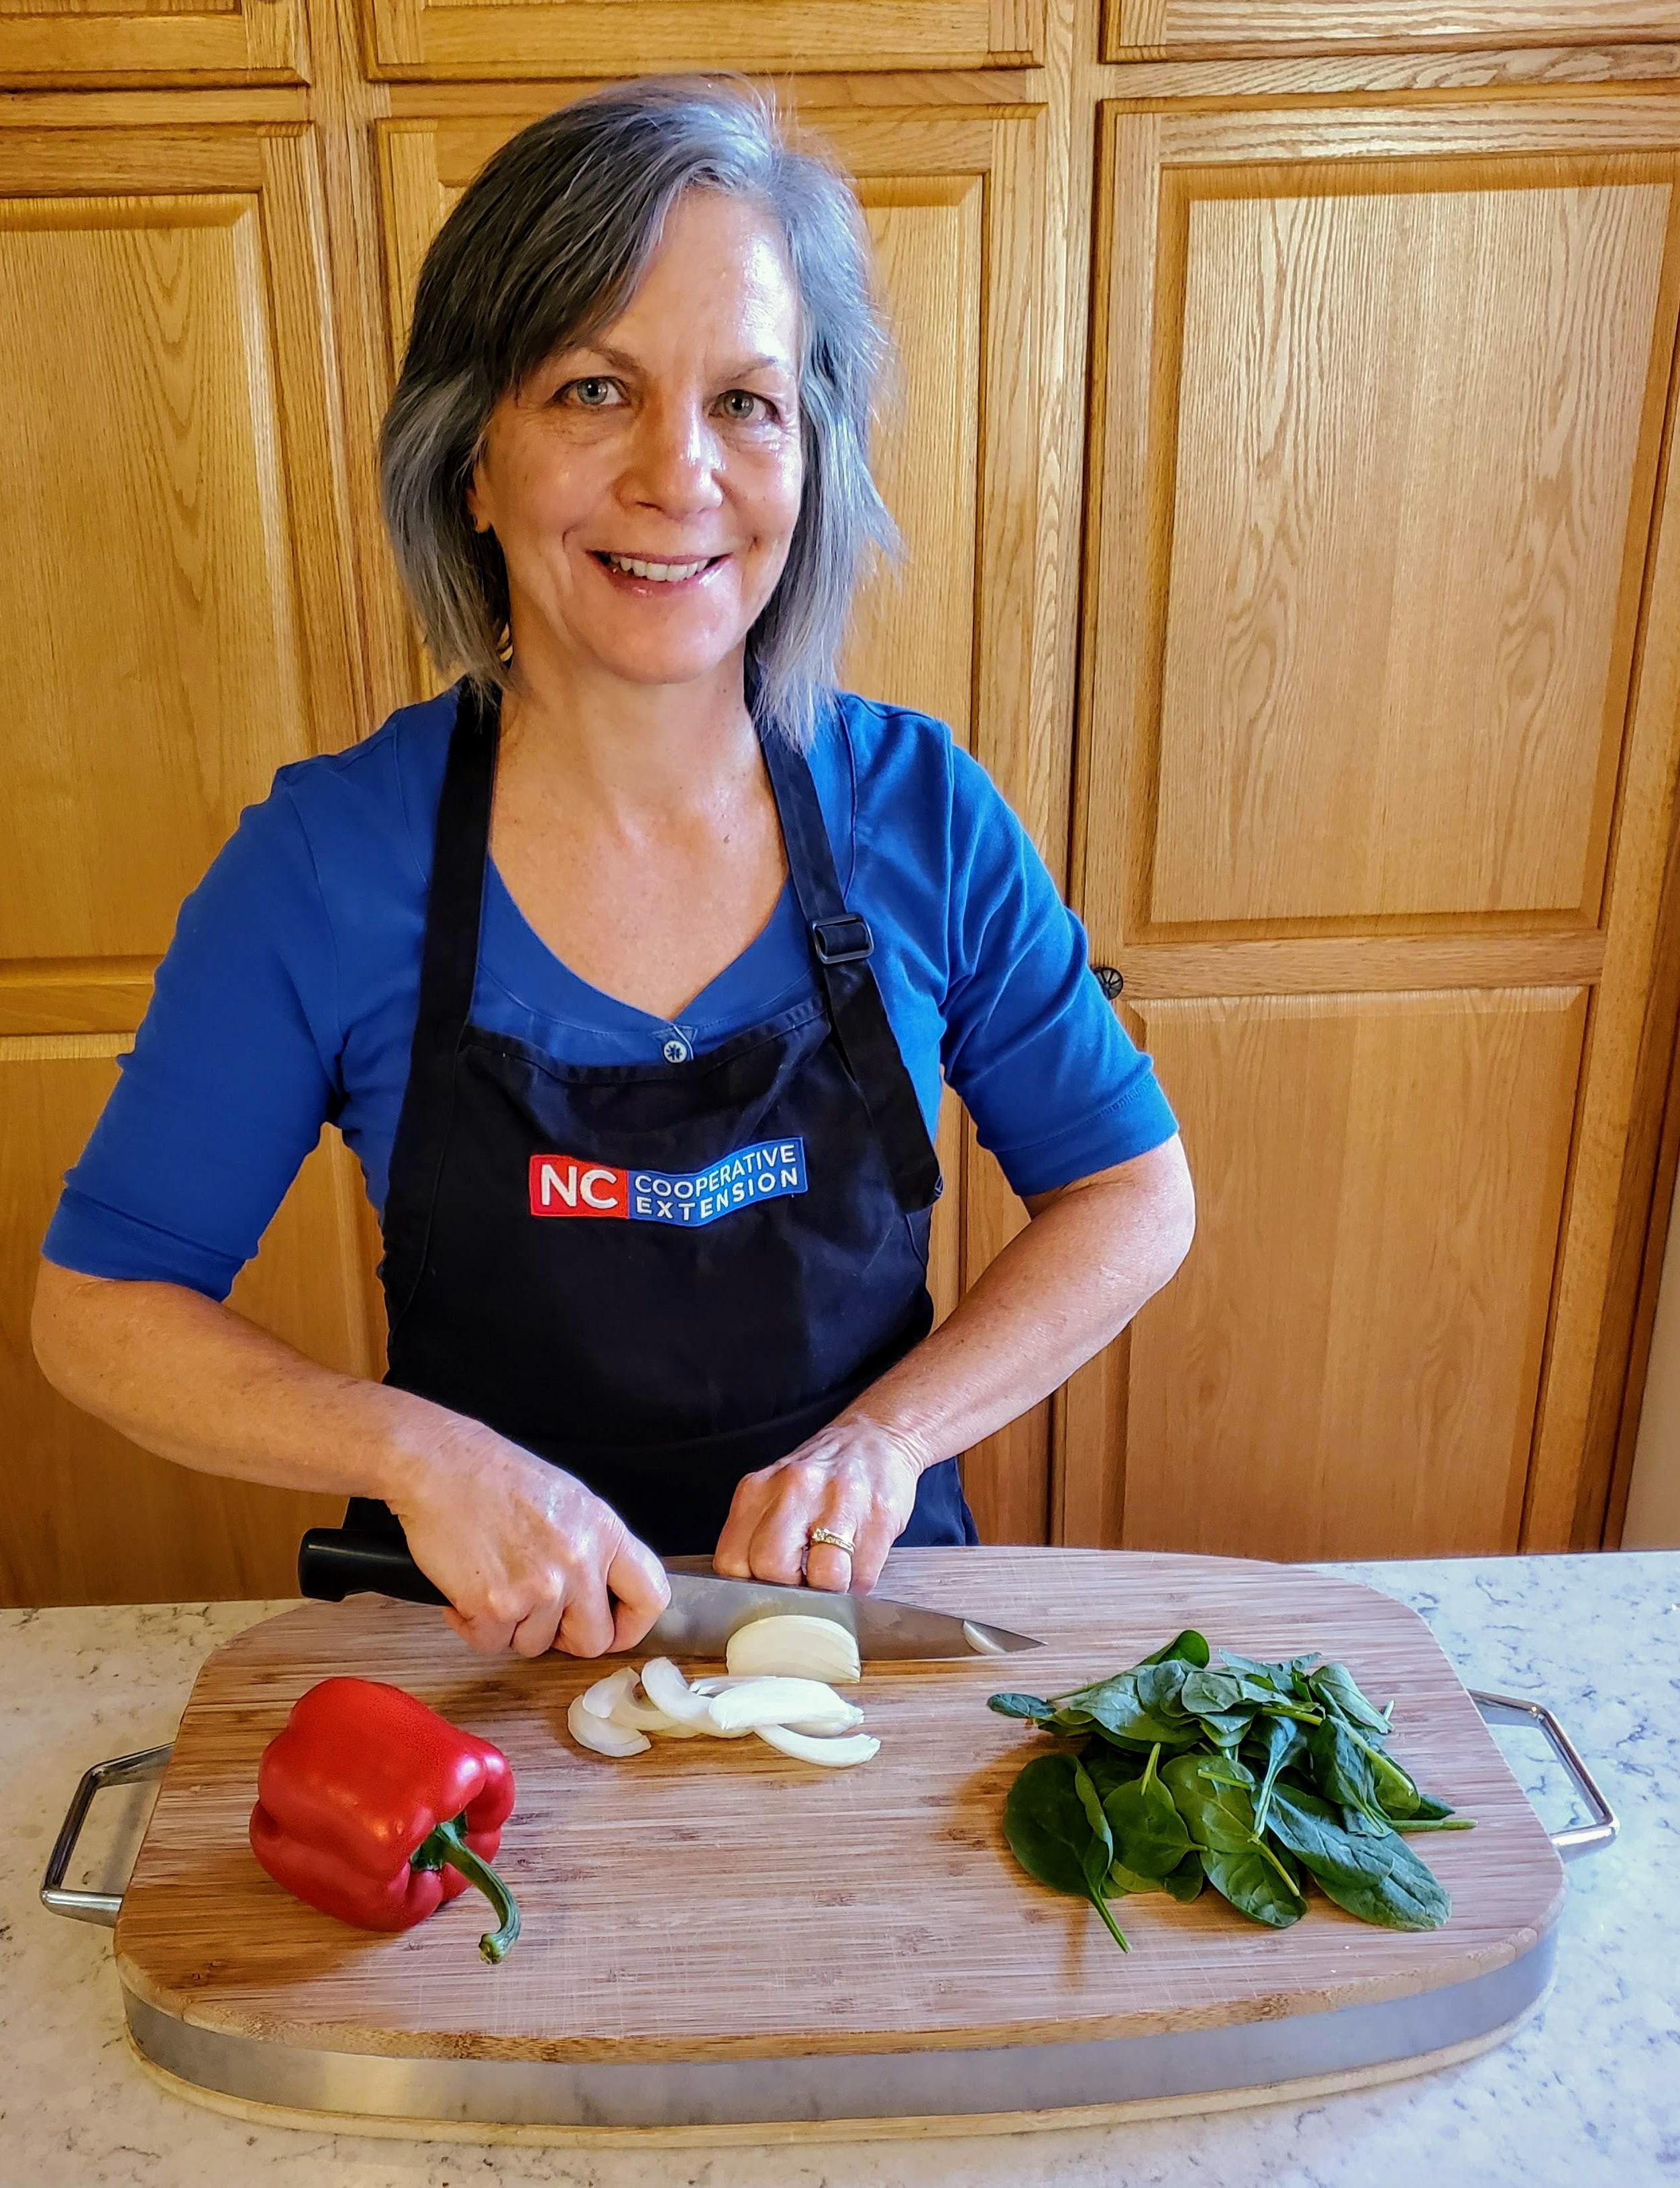 Margie Mansure cuts veggies